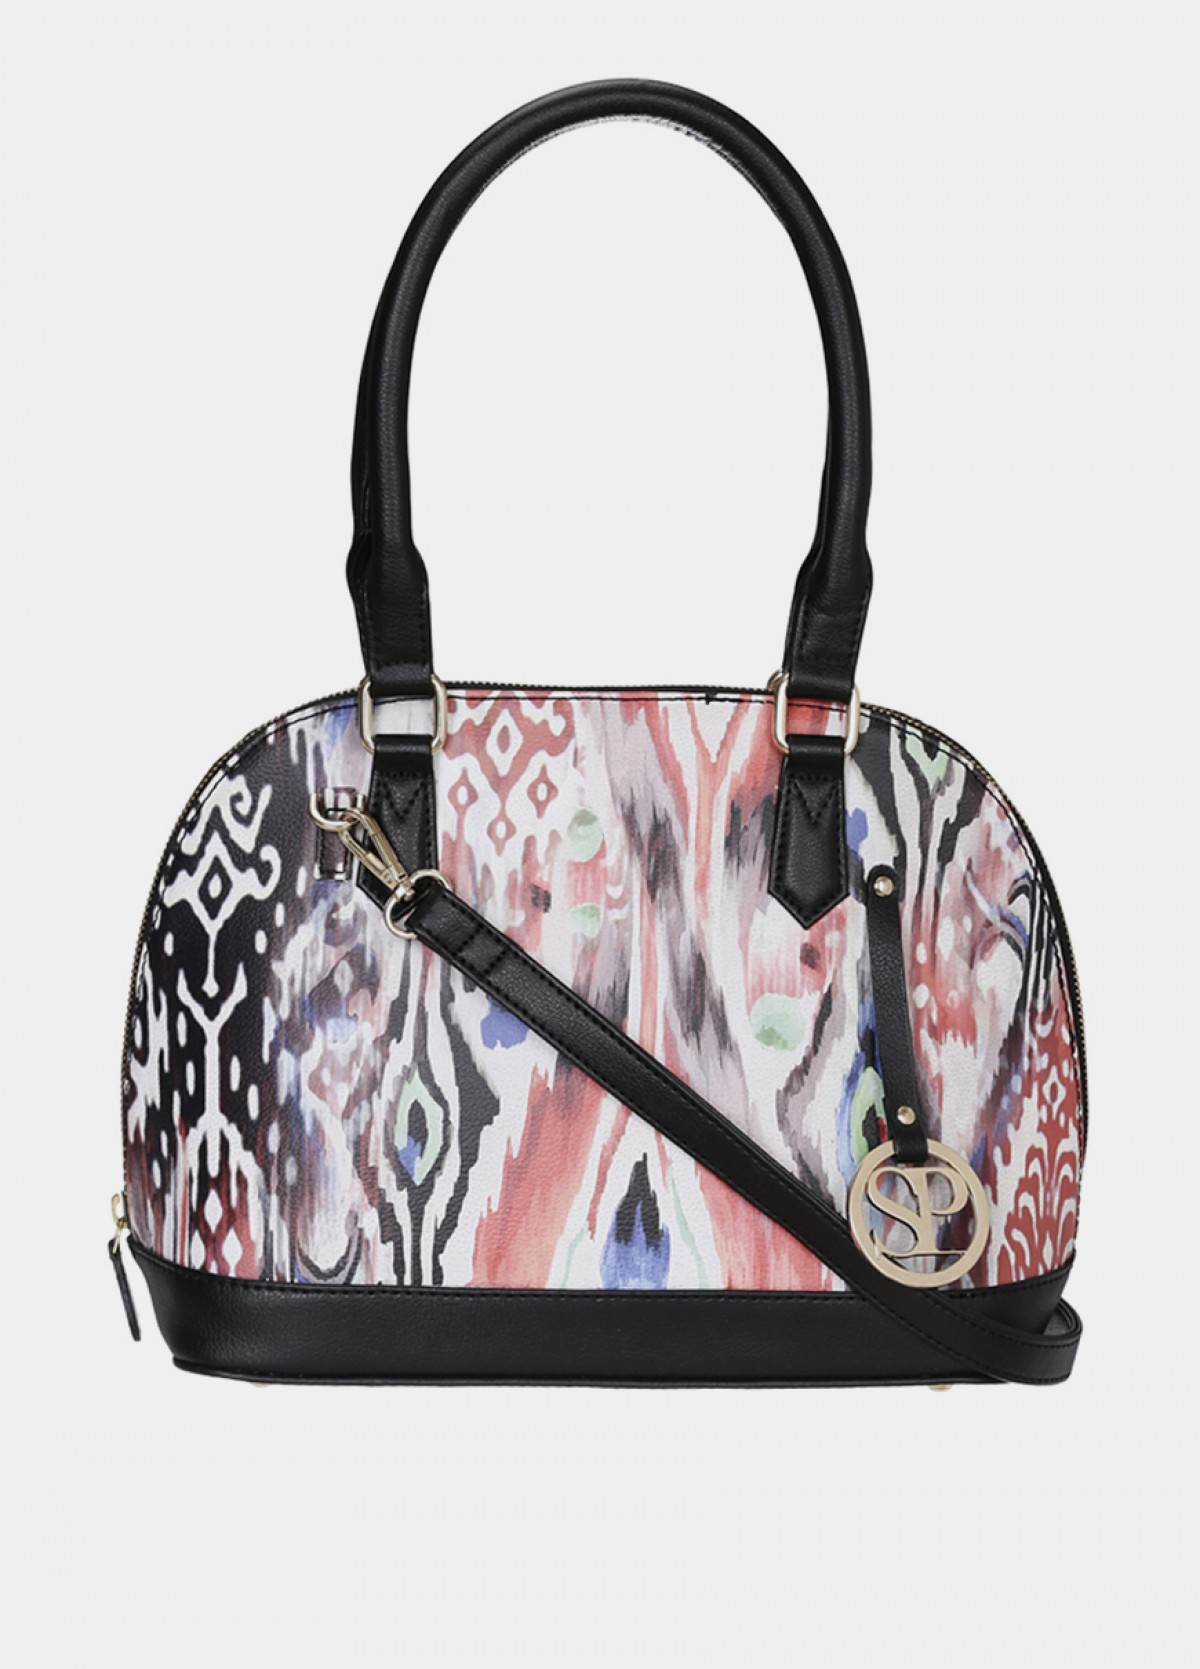 The Black D Shape Handbag